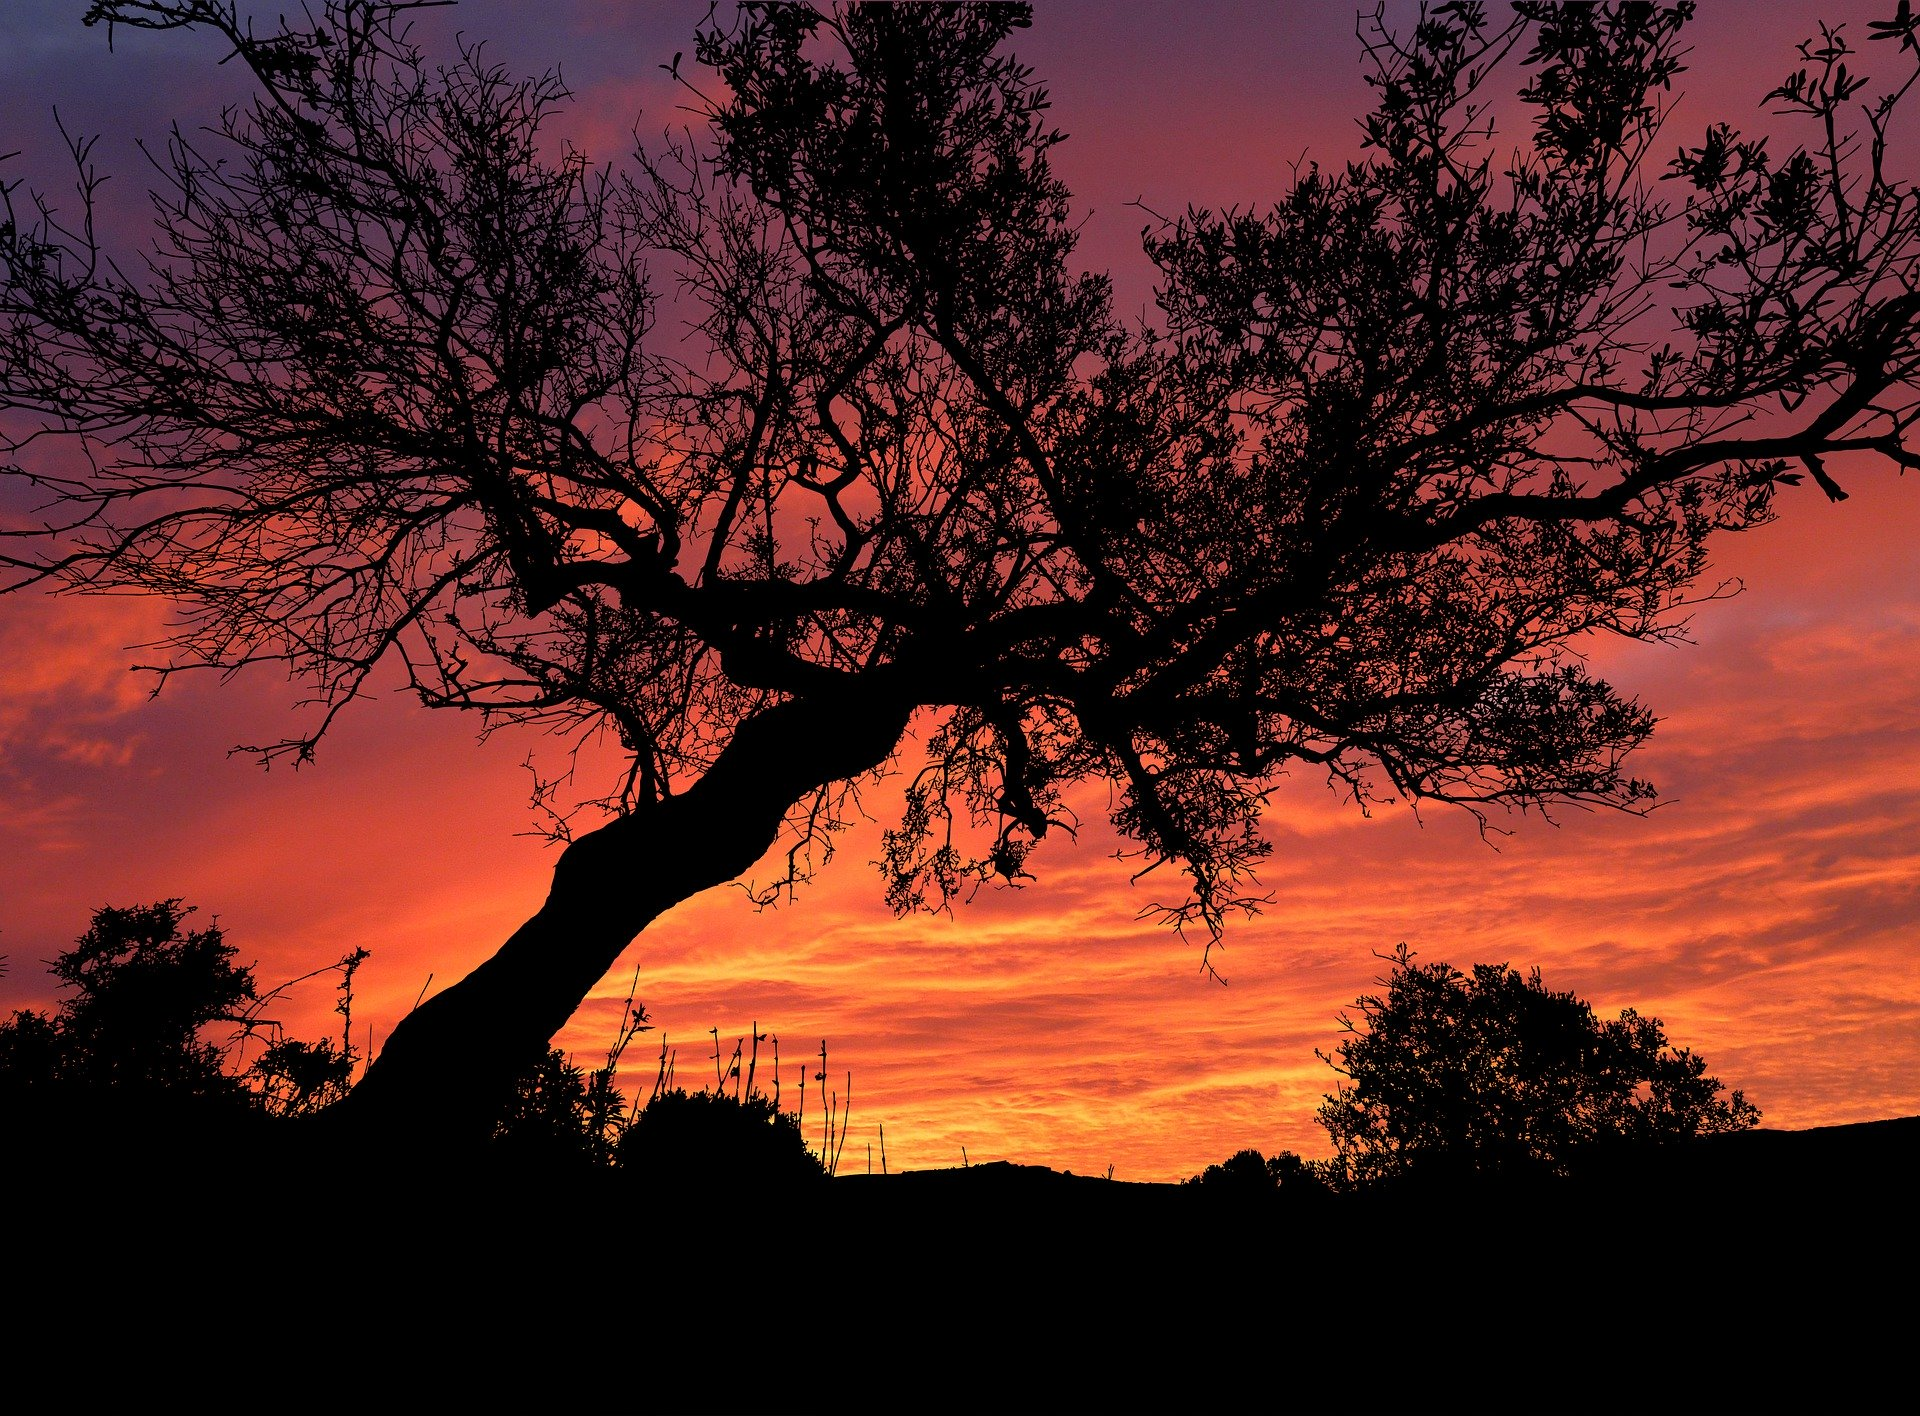 sunset-5335709_1920